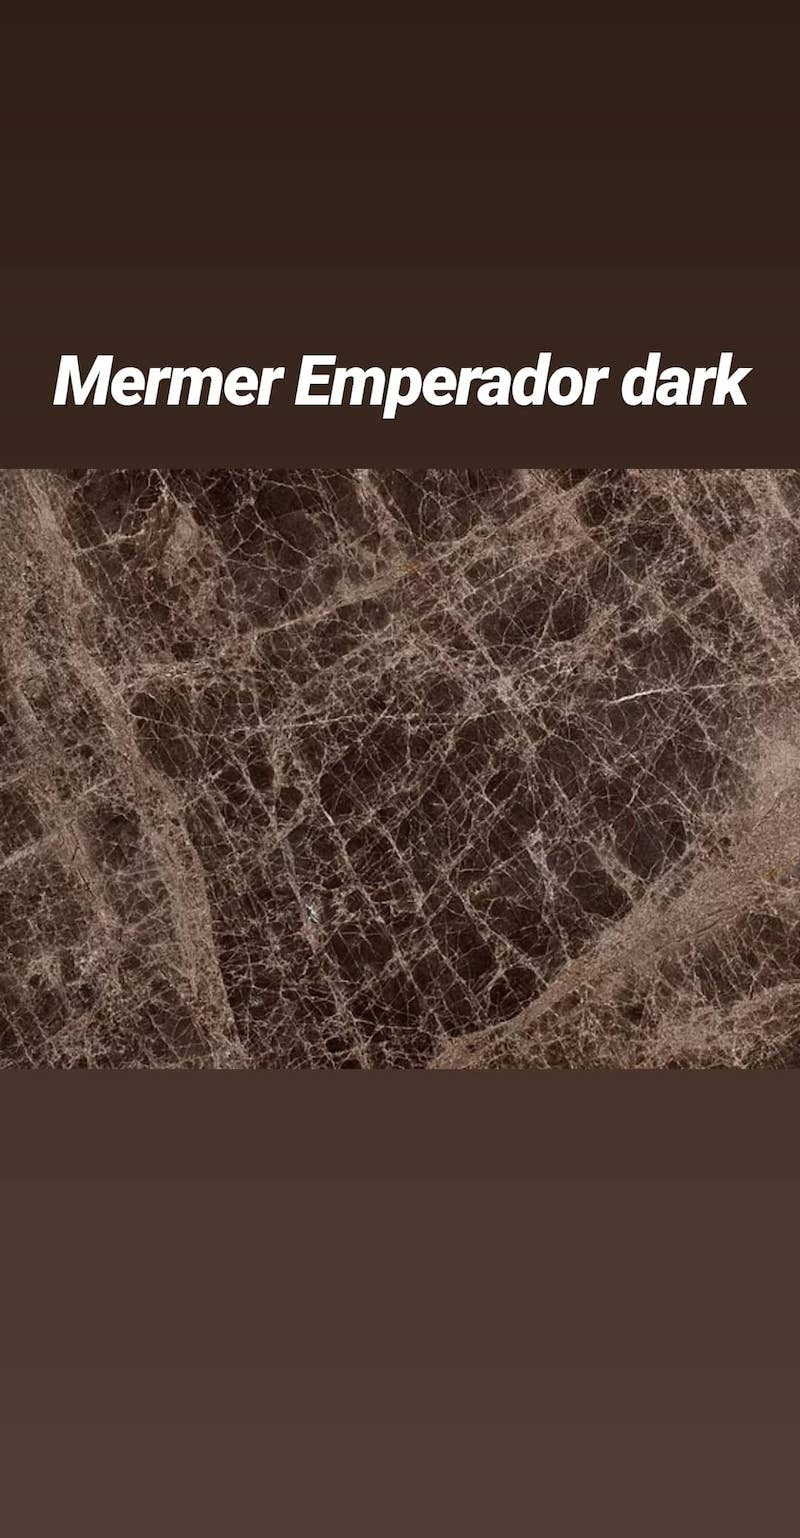 mermer-eperador-dark---21e40d9706cffe8b5e4627231e2c65b1385f0b39